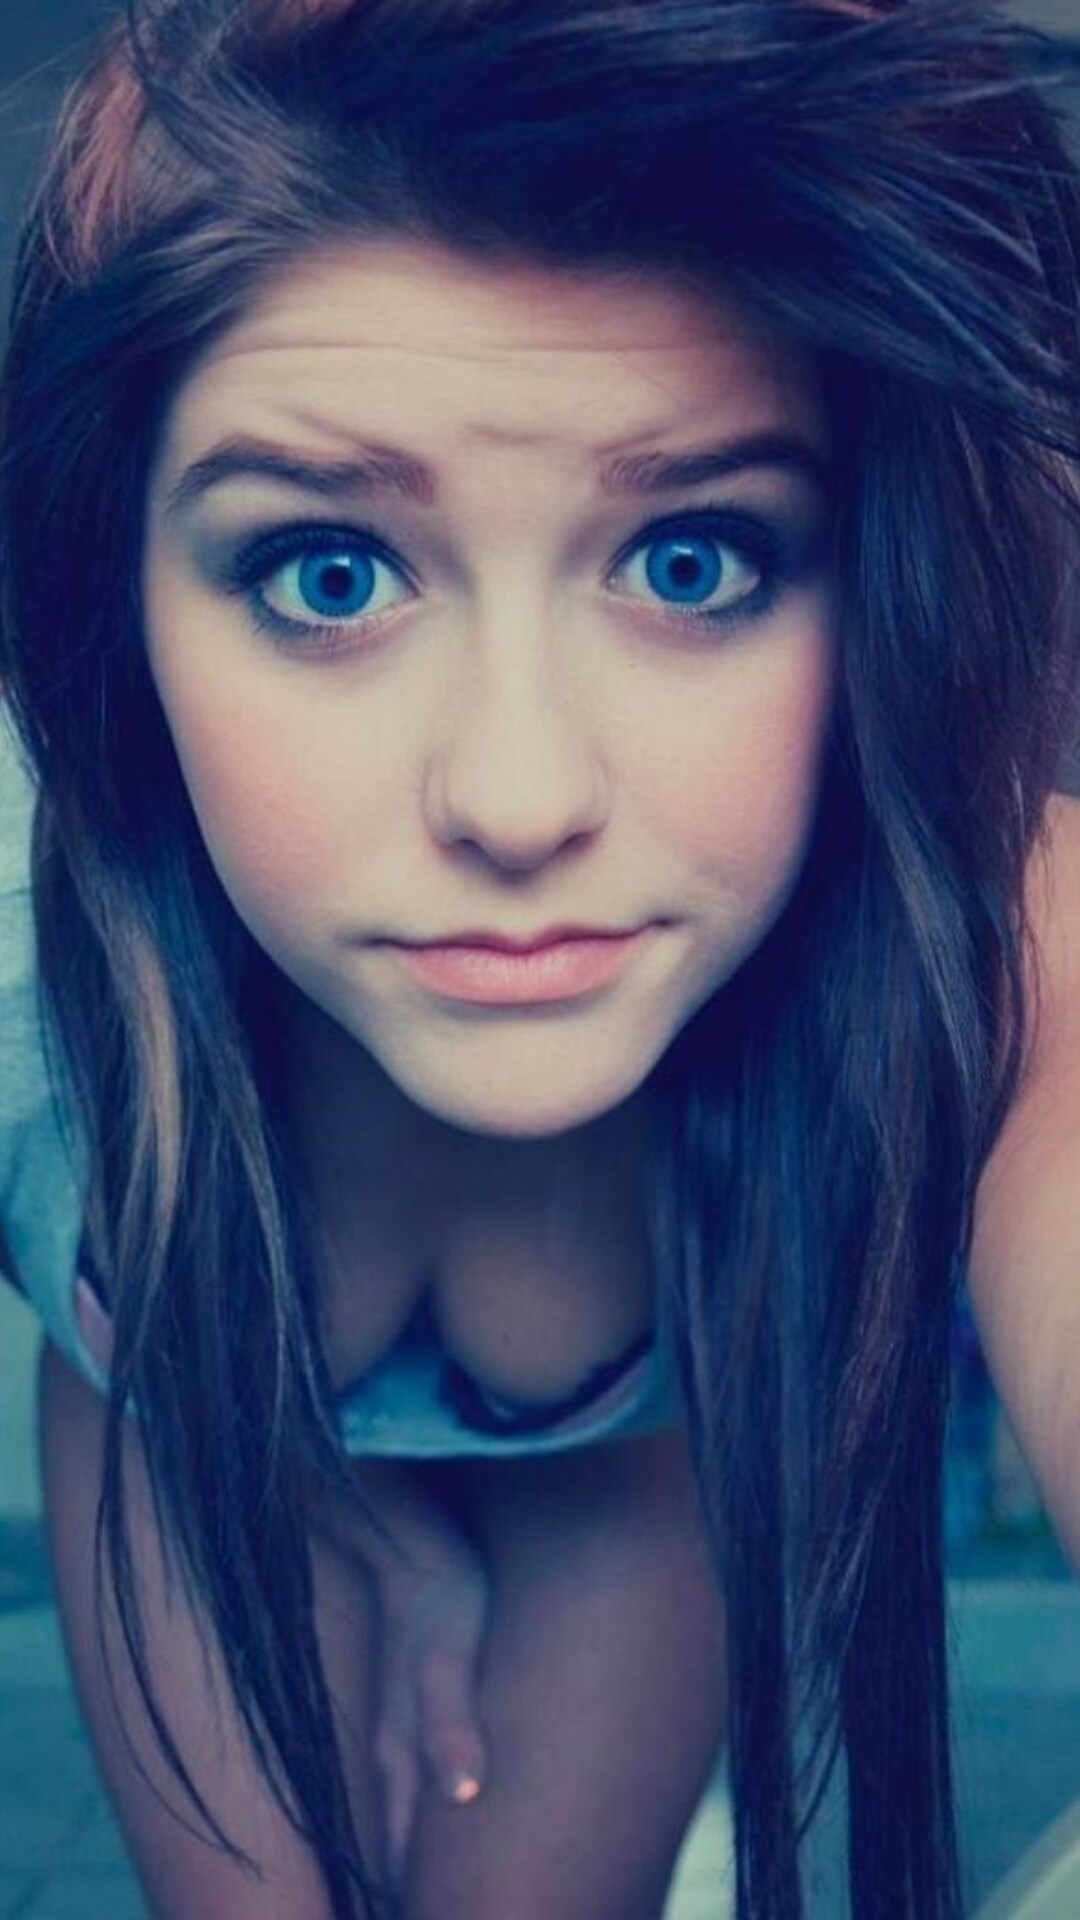 1080x1920 blue eyes cute teen girl iphone 76s6 plus